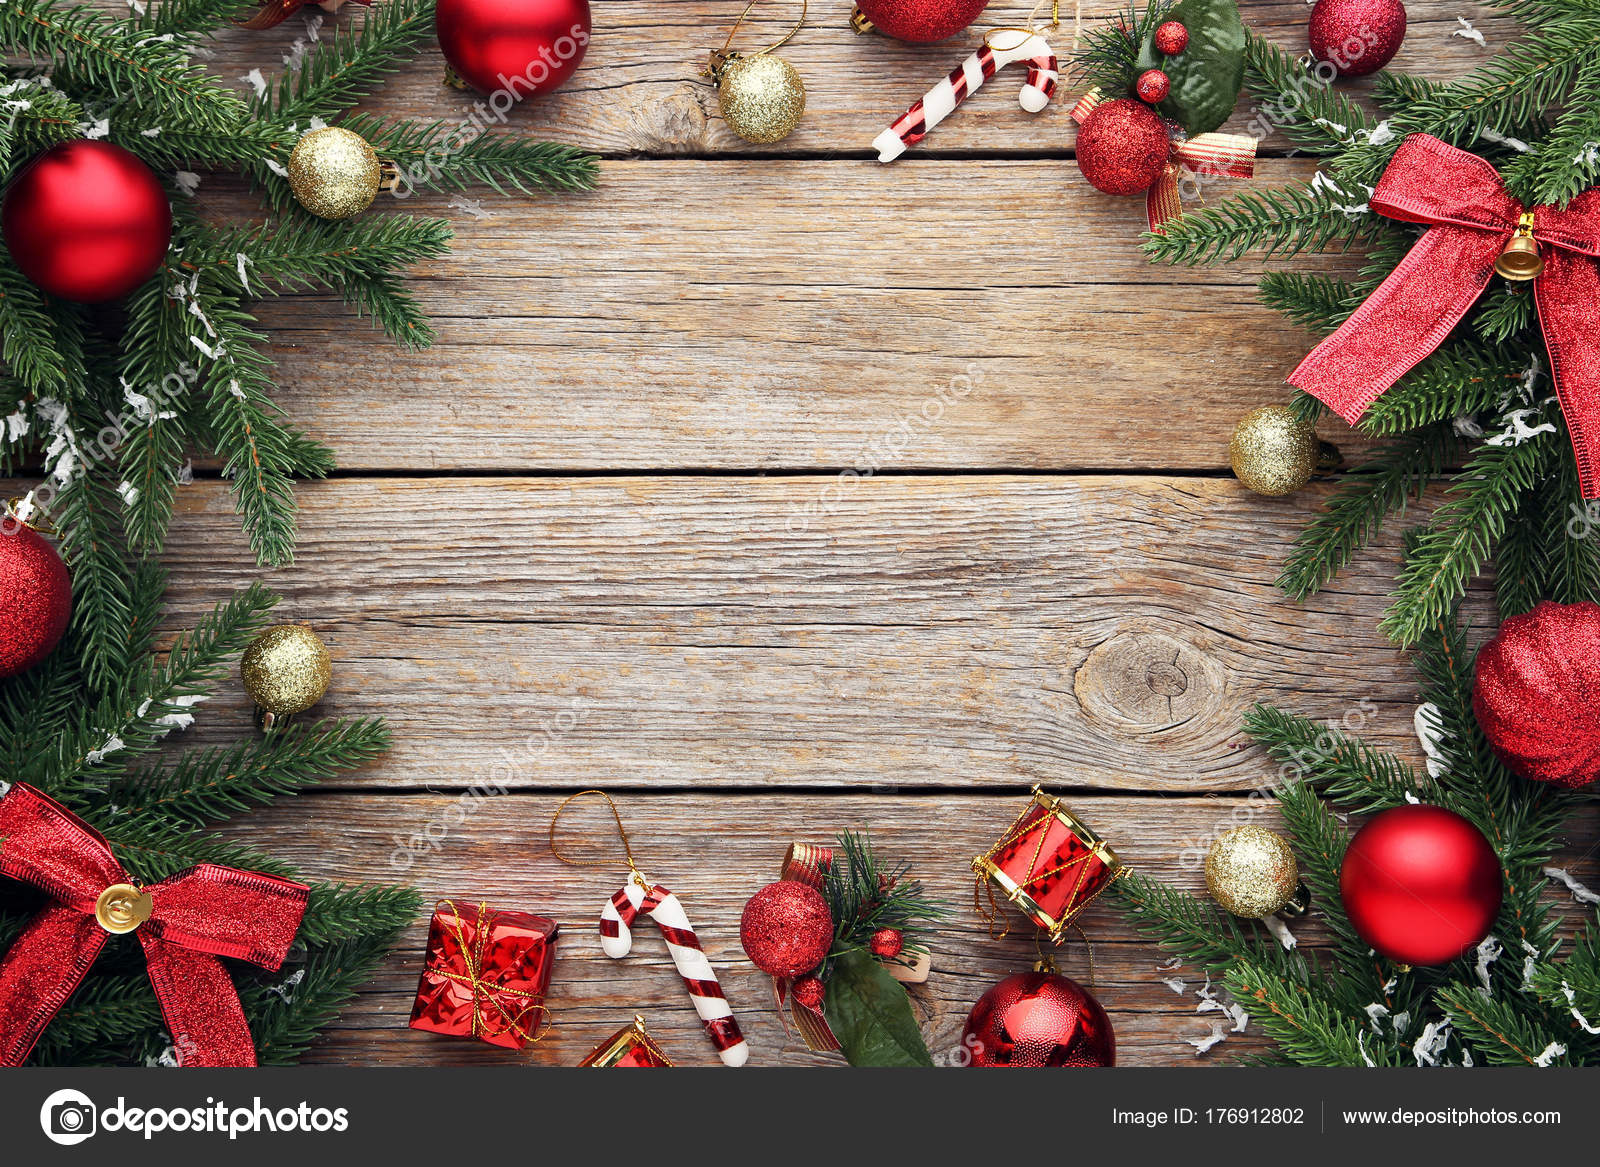 Ramas Abeto Con Adornos Navidad Mesa Madera Fotos De Stock - Adronos-de-navidad